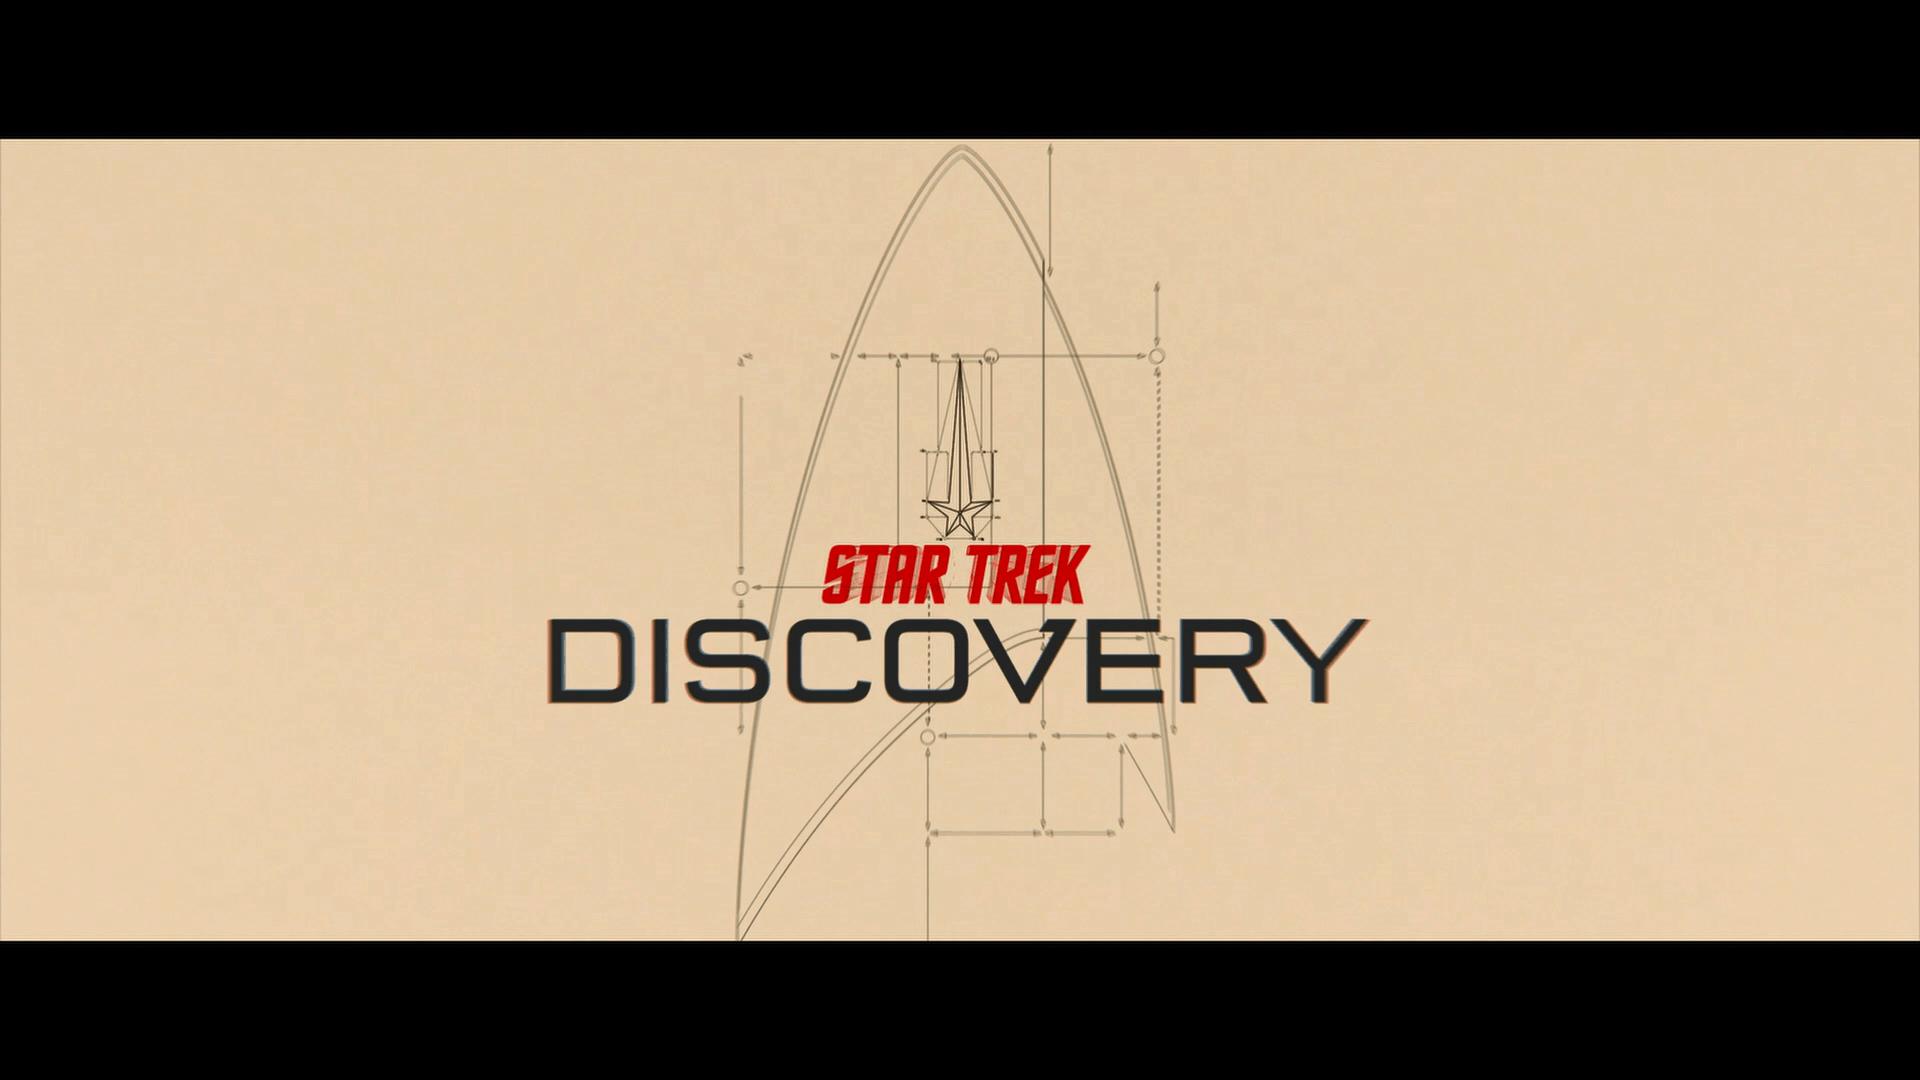 STAR TREK DISCOVERY SEASON 3 LOGO